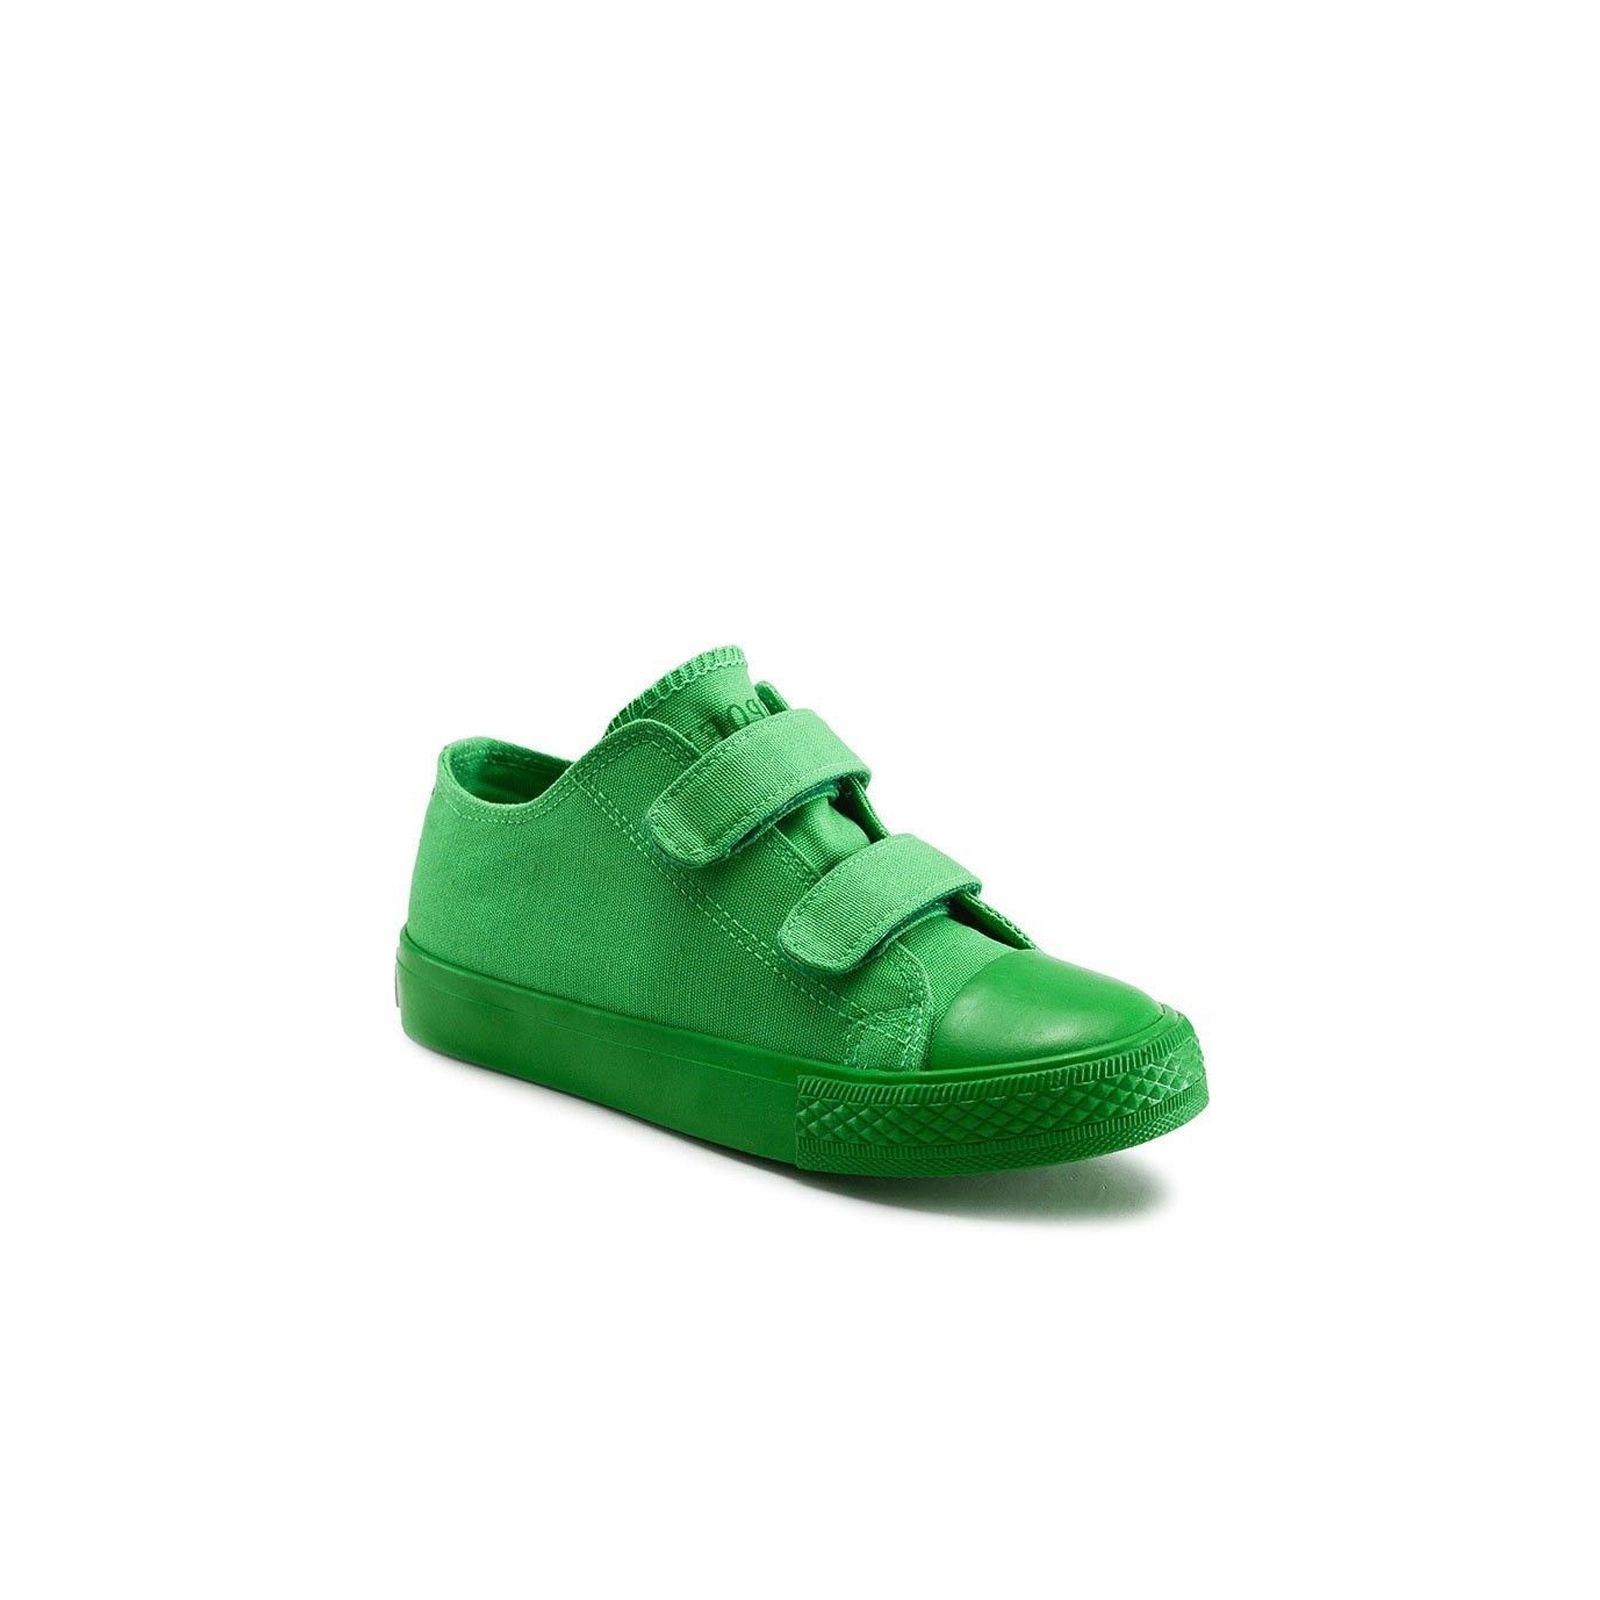 a67de3563 Little Blue Lamb - Soft sole girls Toddler kids baby shoes